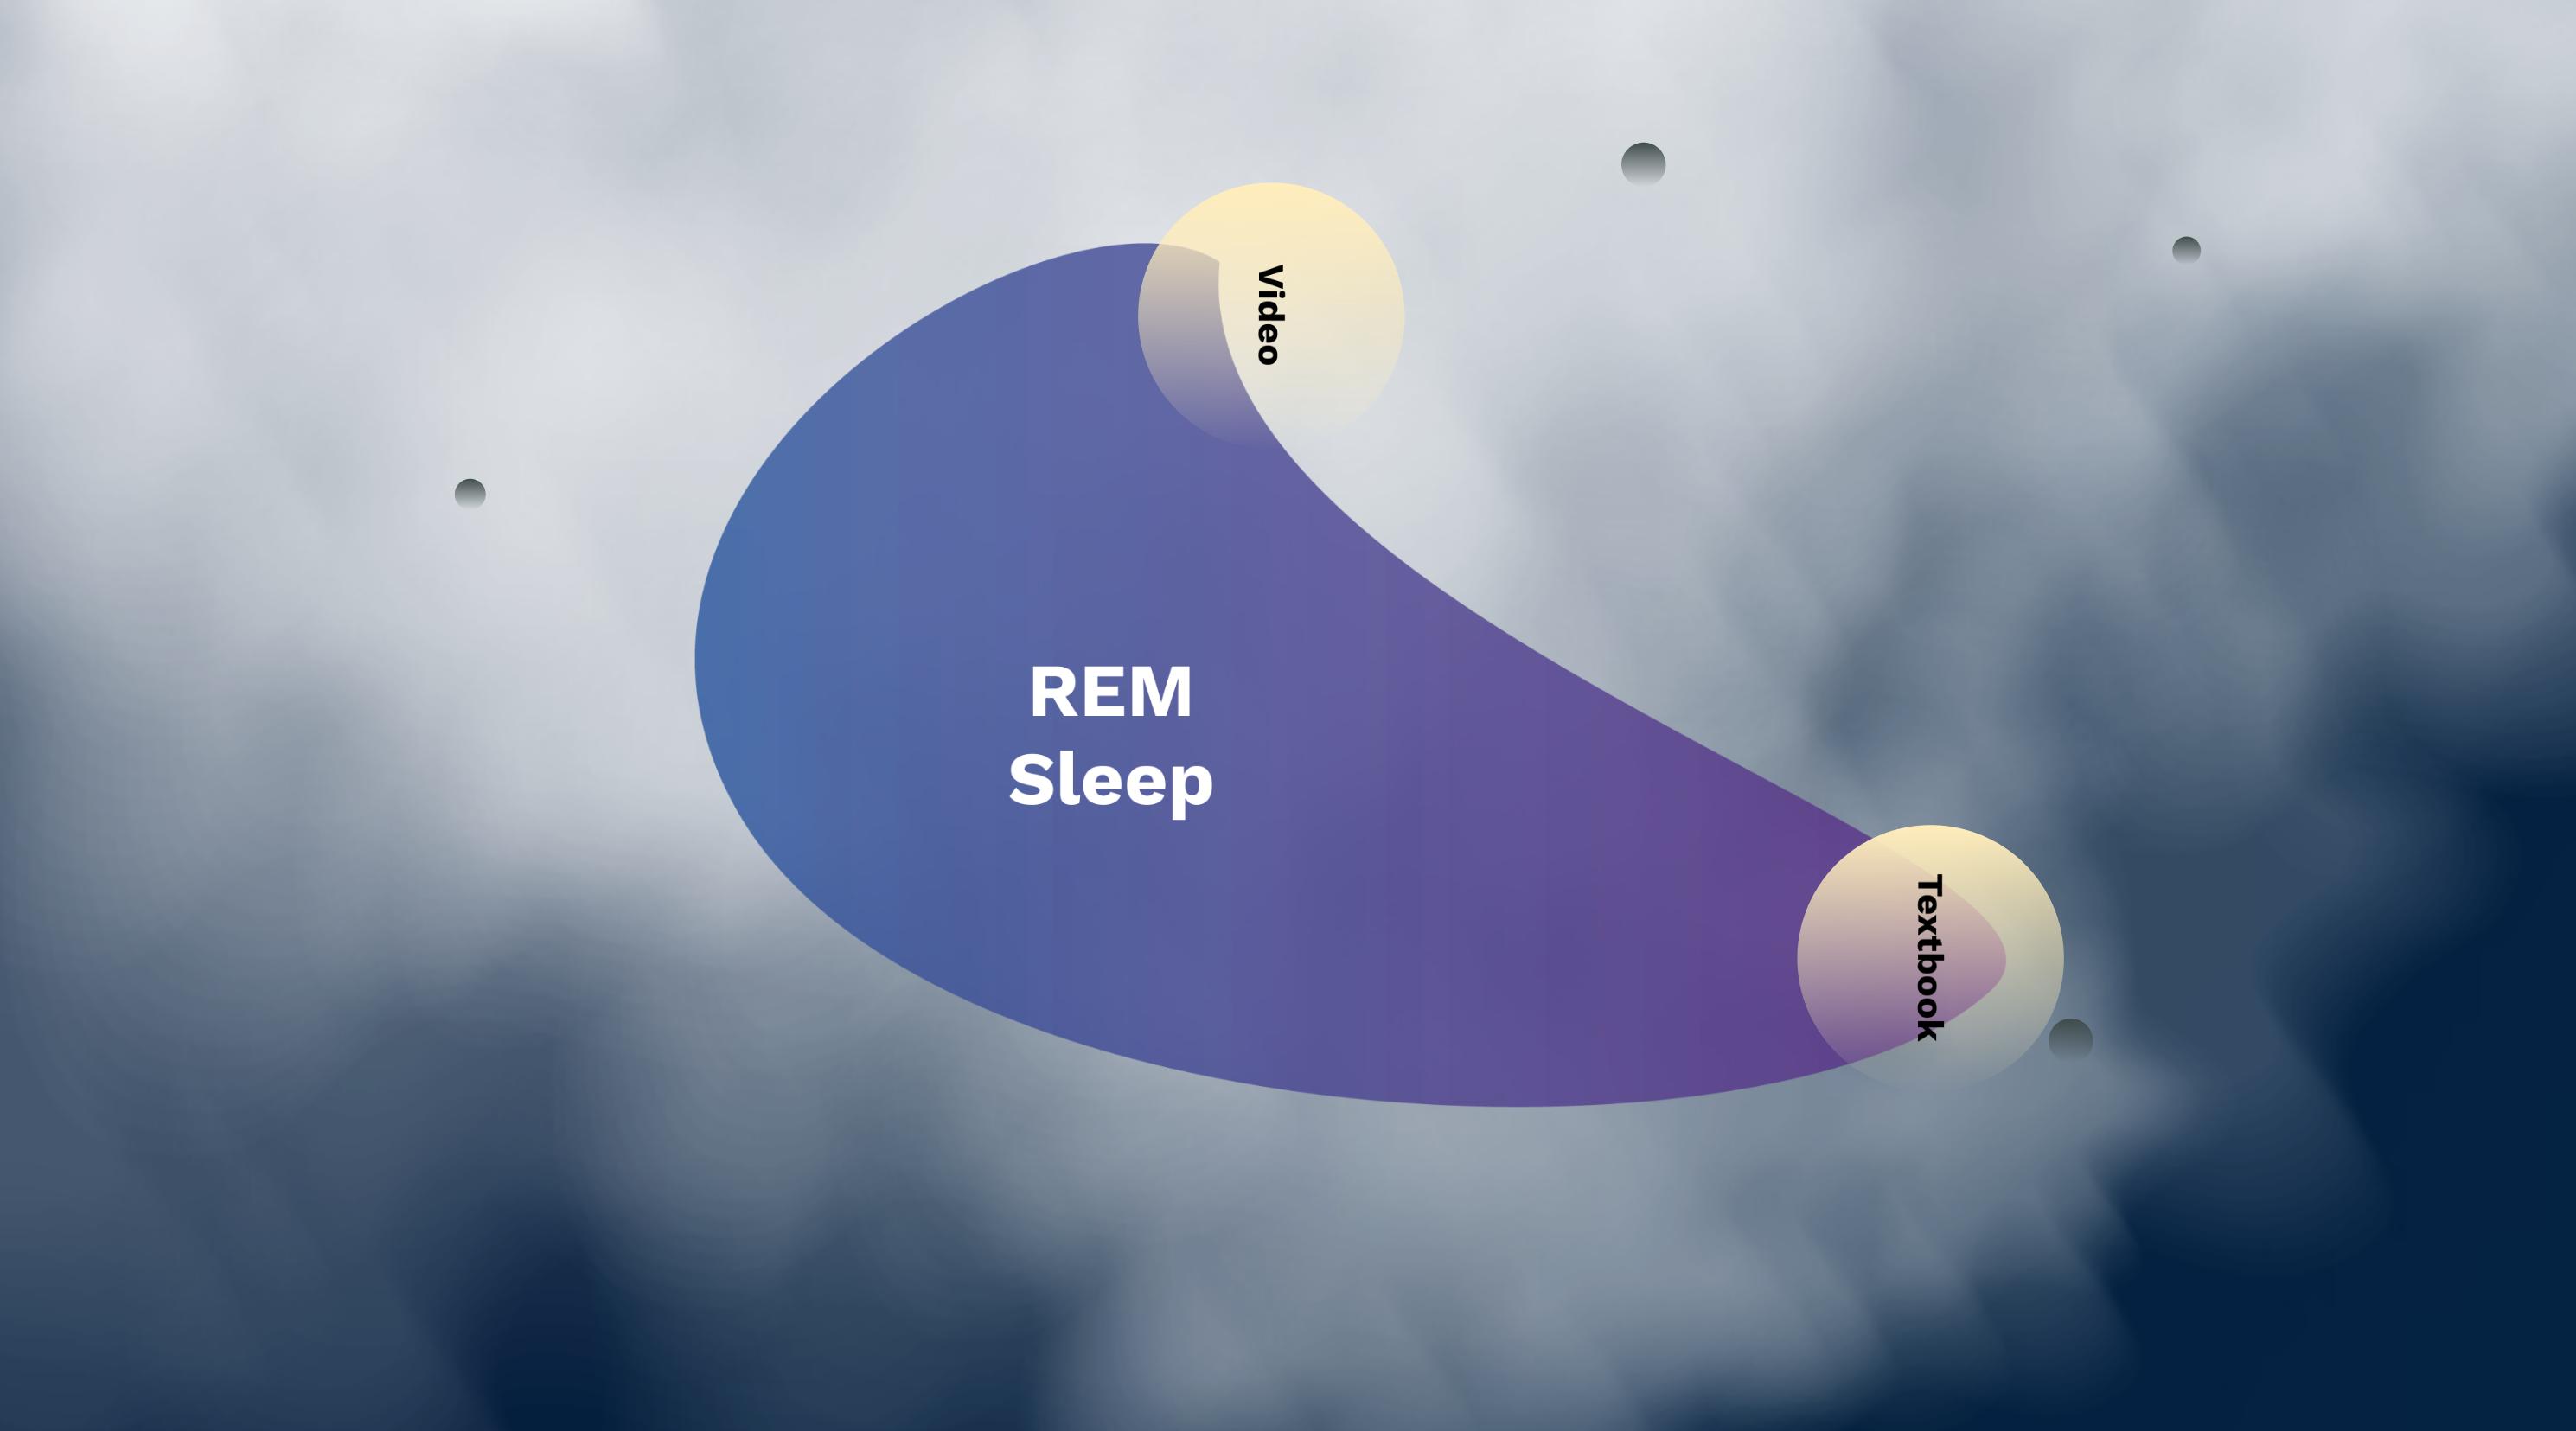 REM stage Dreams Psychology Prezi Presentation for BCIT Psyc 1101 | Monika Szucs